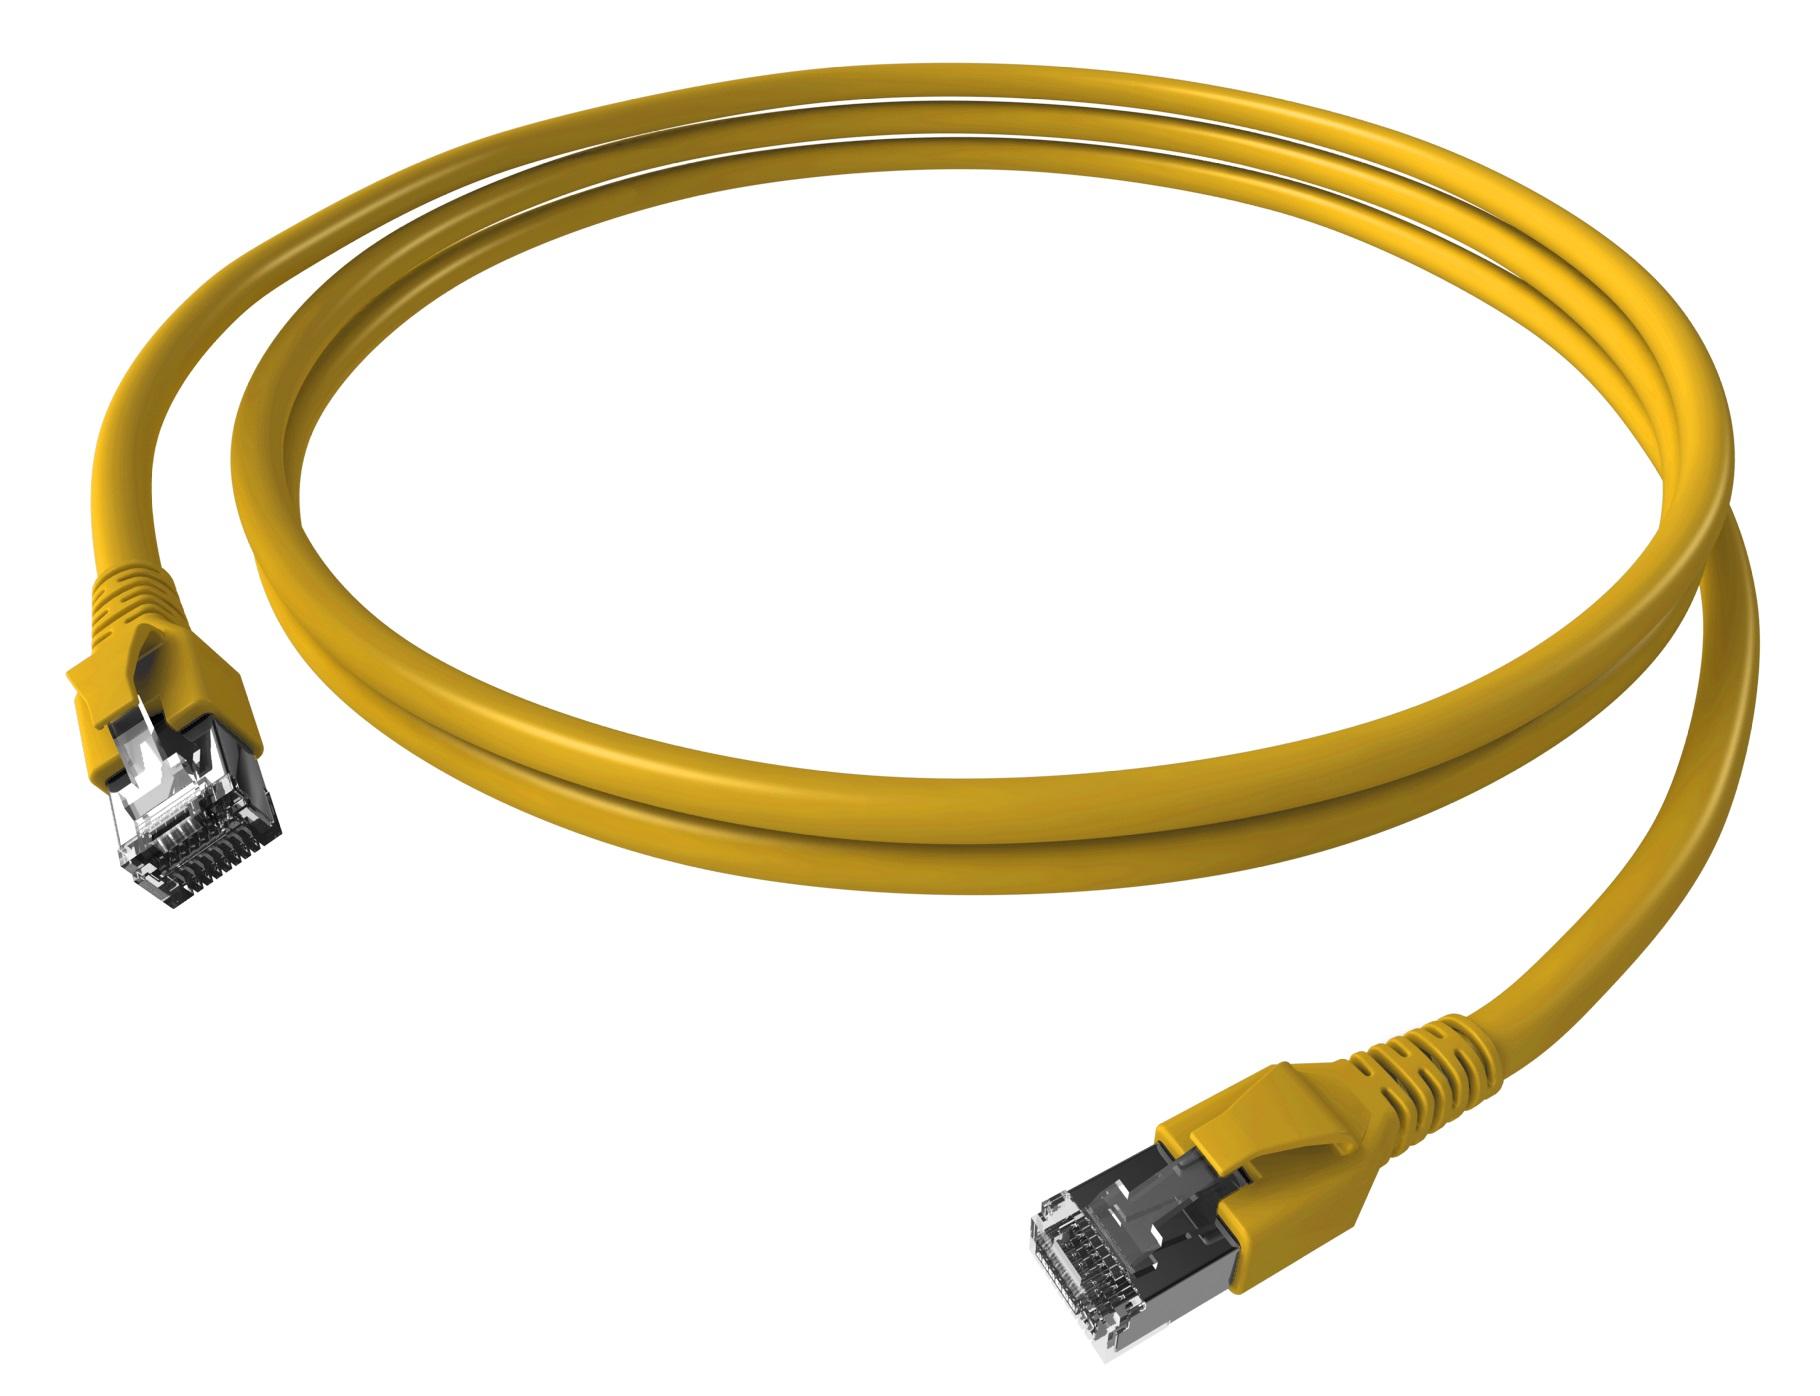 1 Stk Patchkabel RJ45 geschirmt Cat.6a 10GB, LS0H, gelb,  1,0m H6GTY01K0Y